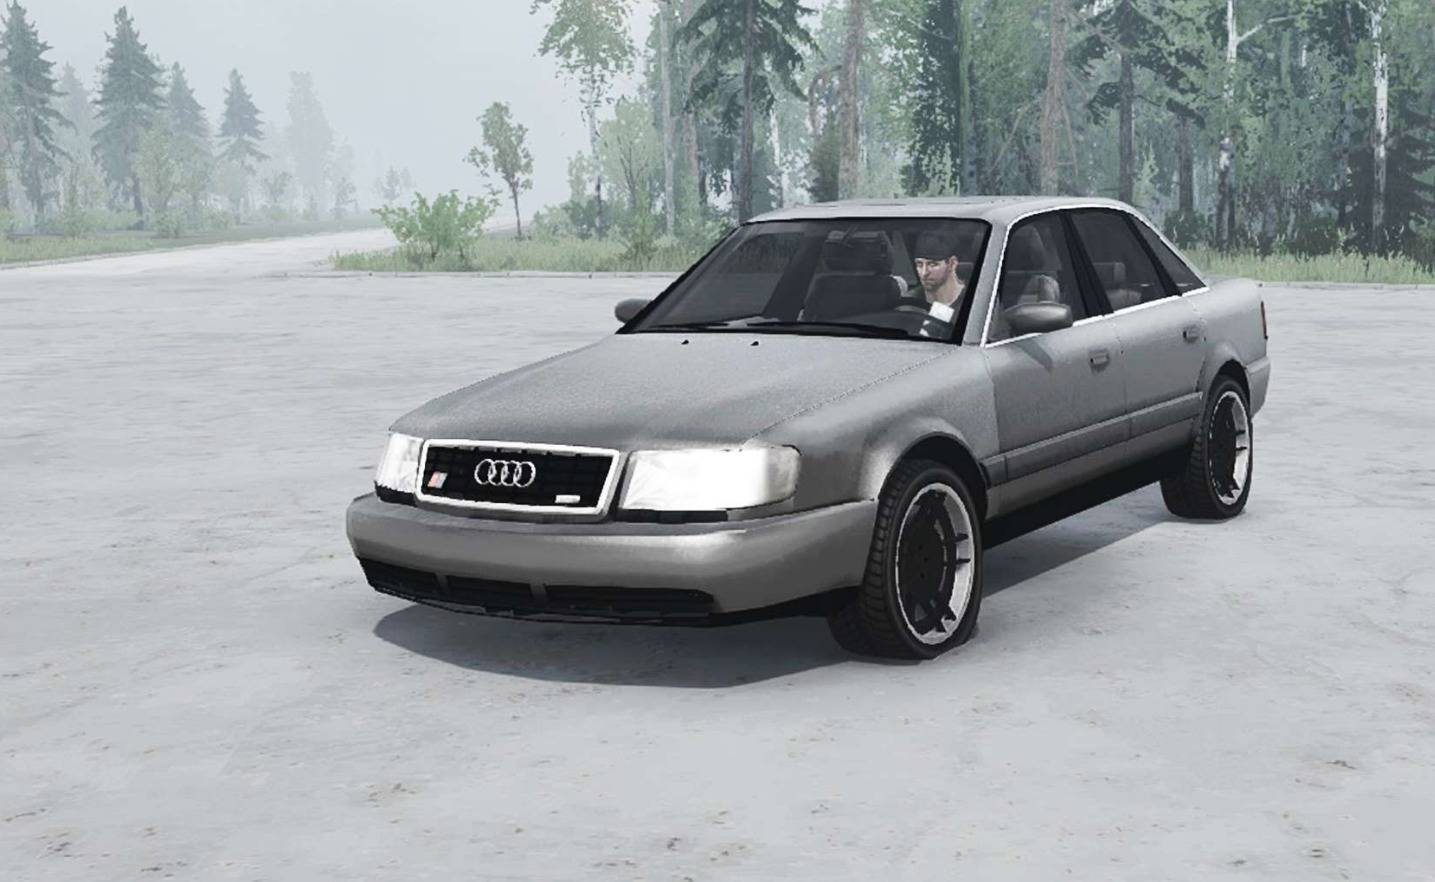 Audi S6 (C4) 1997